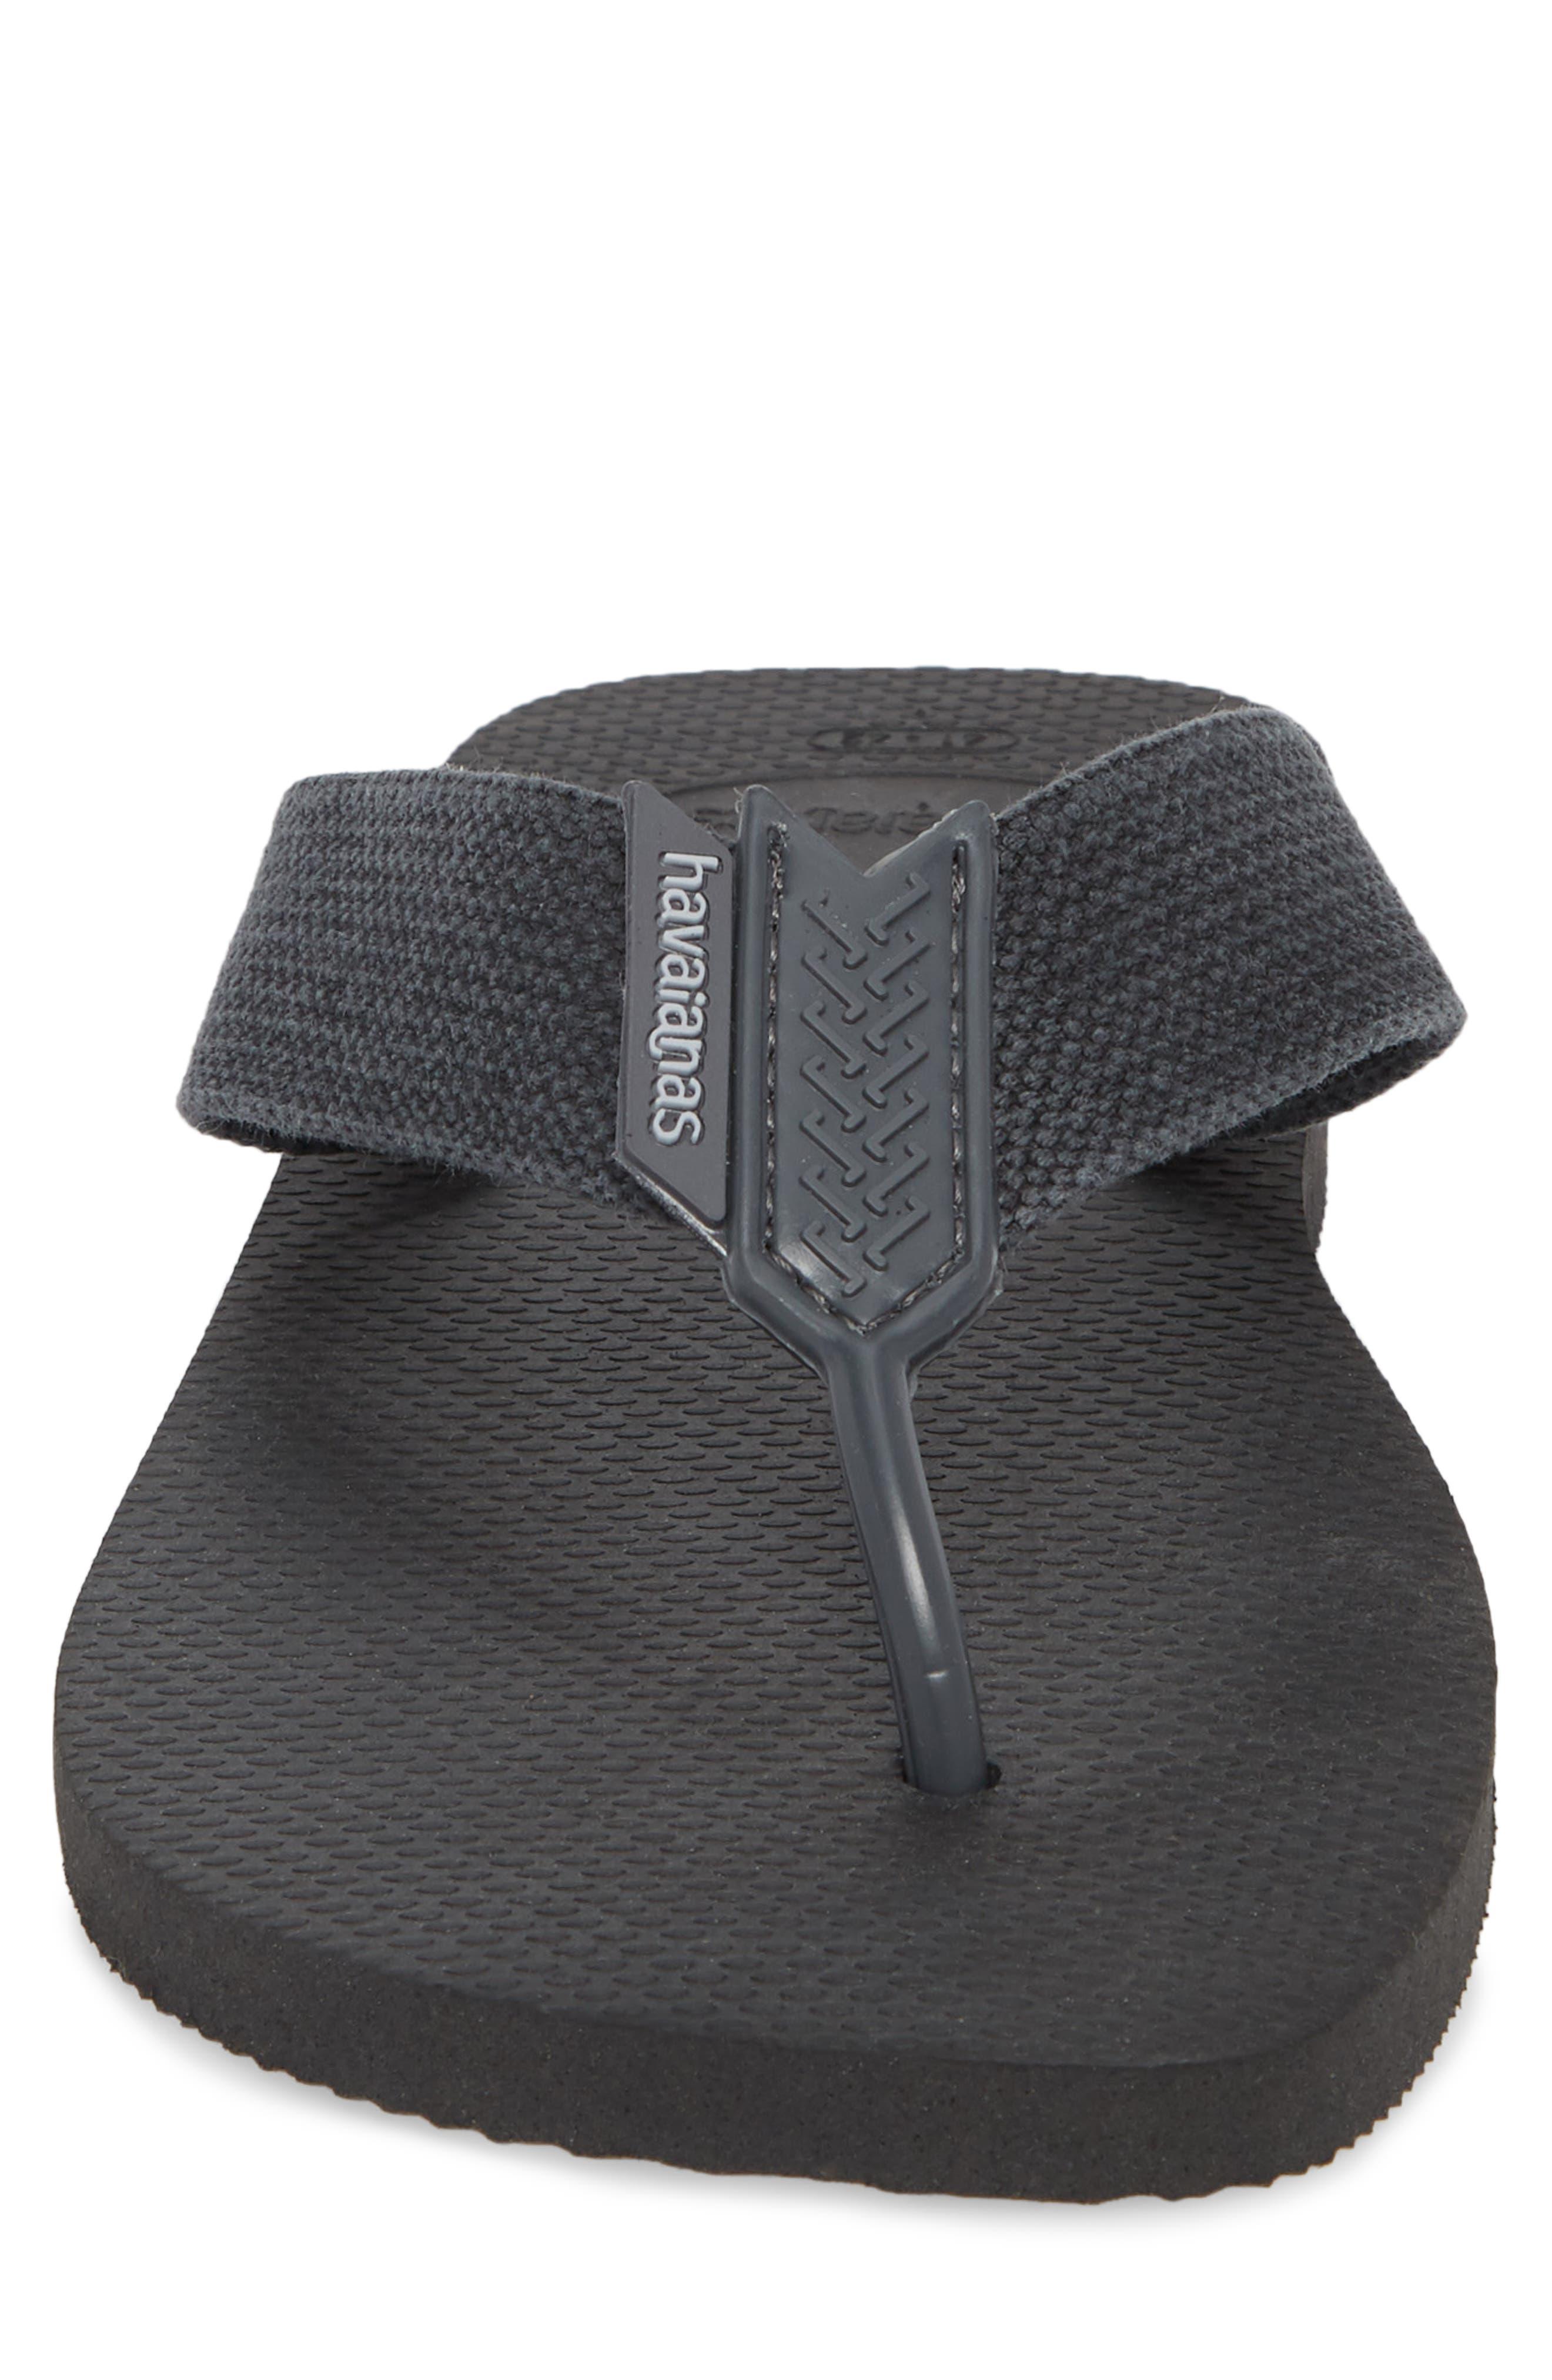 Havianas 'Urban Basic' Flip Flop,                             Alternate thumbnail 4, color,                             Black/ Grey